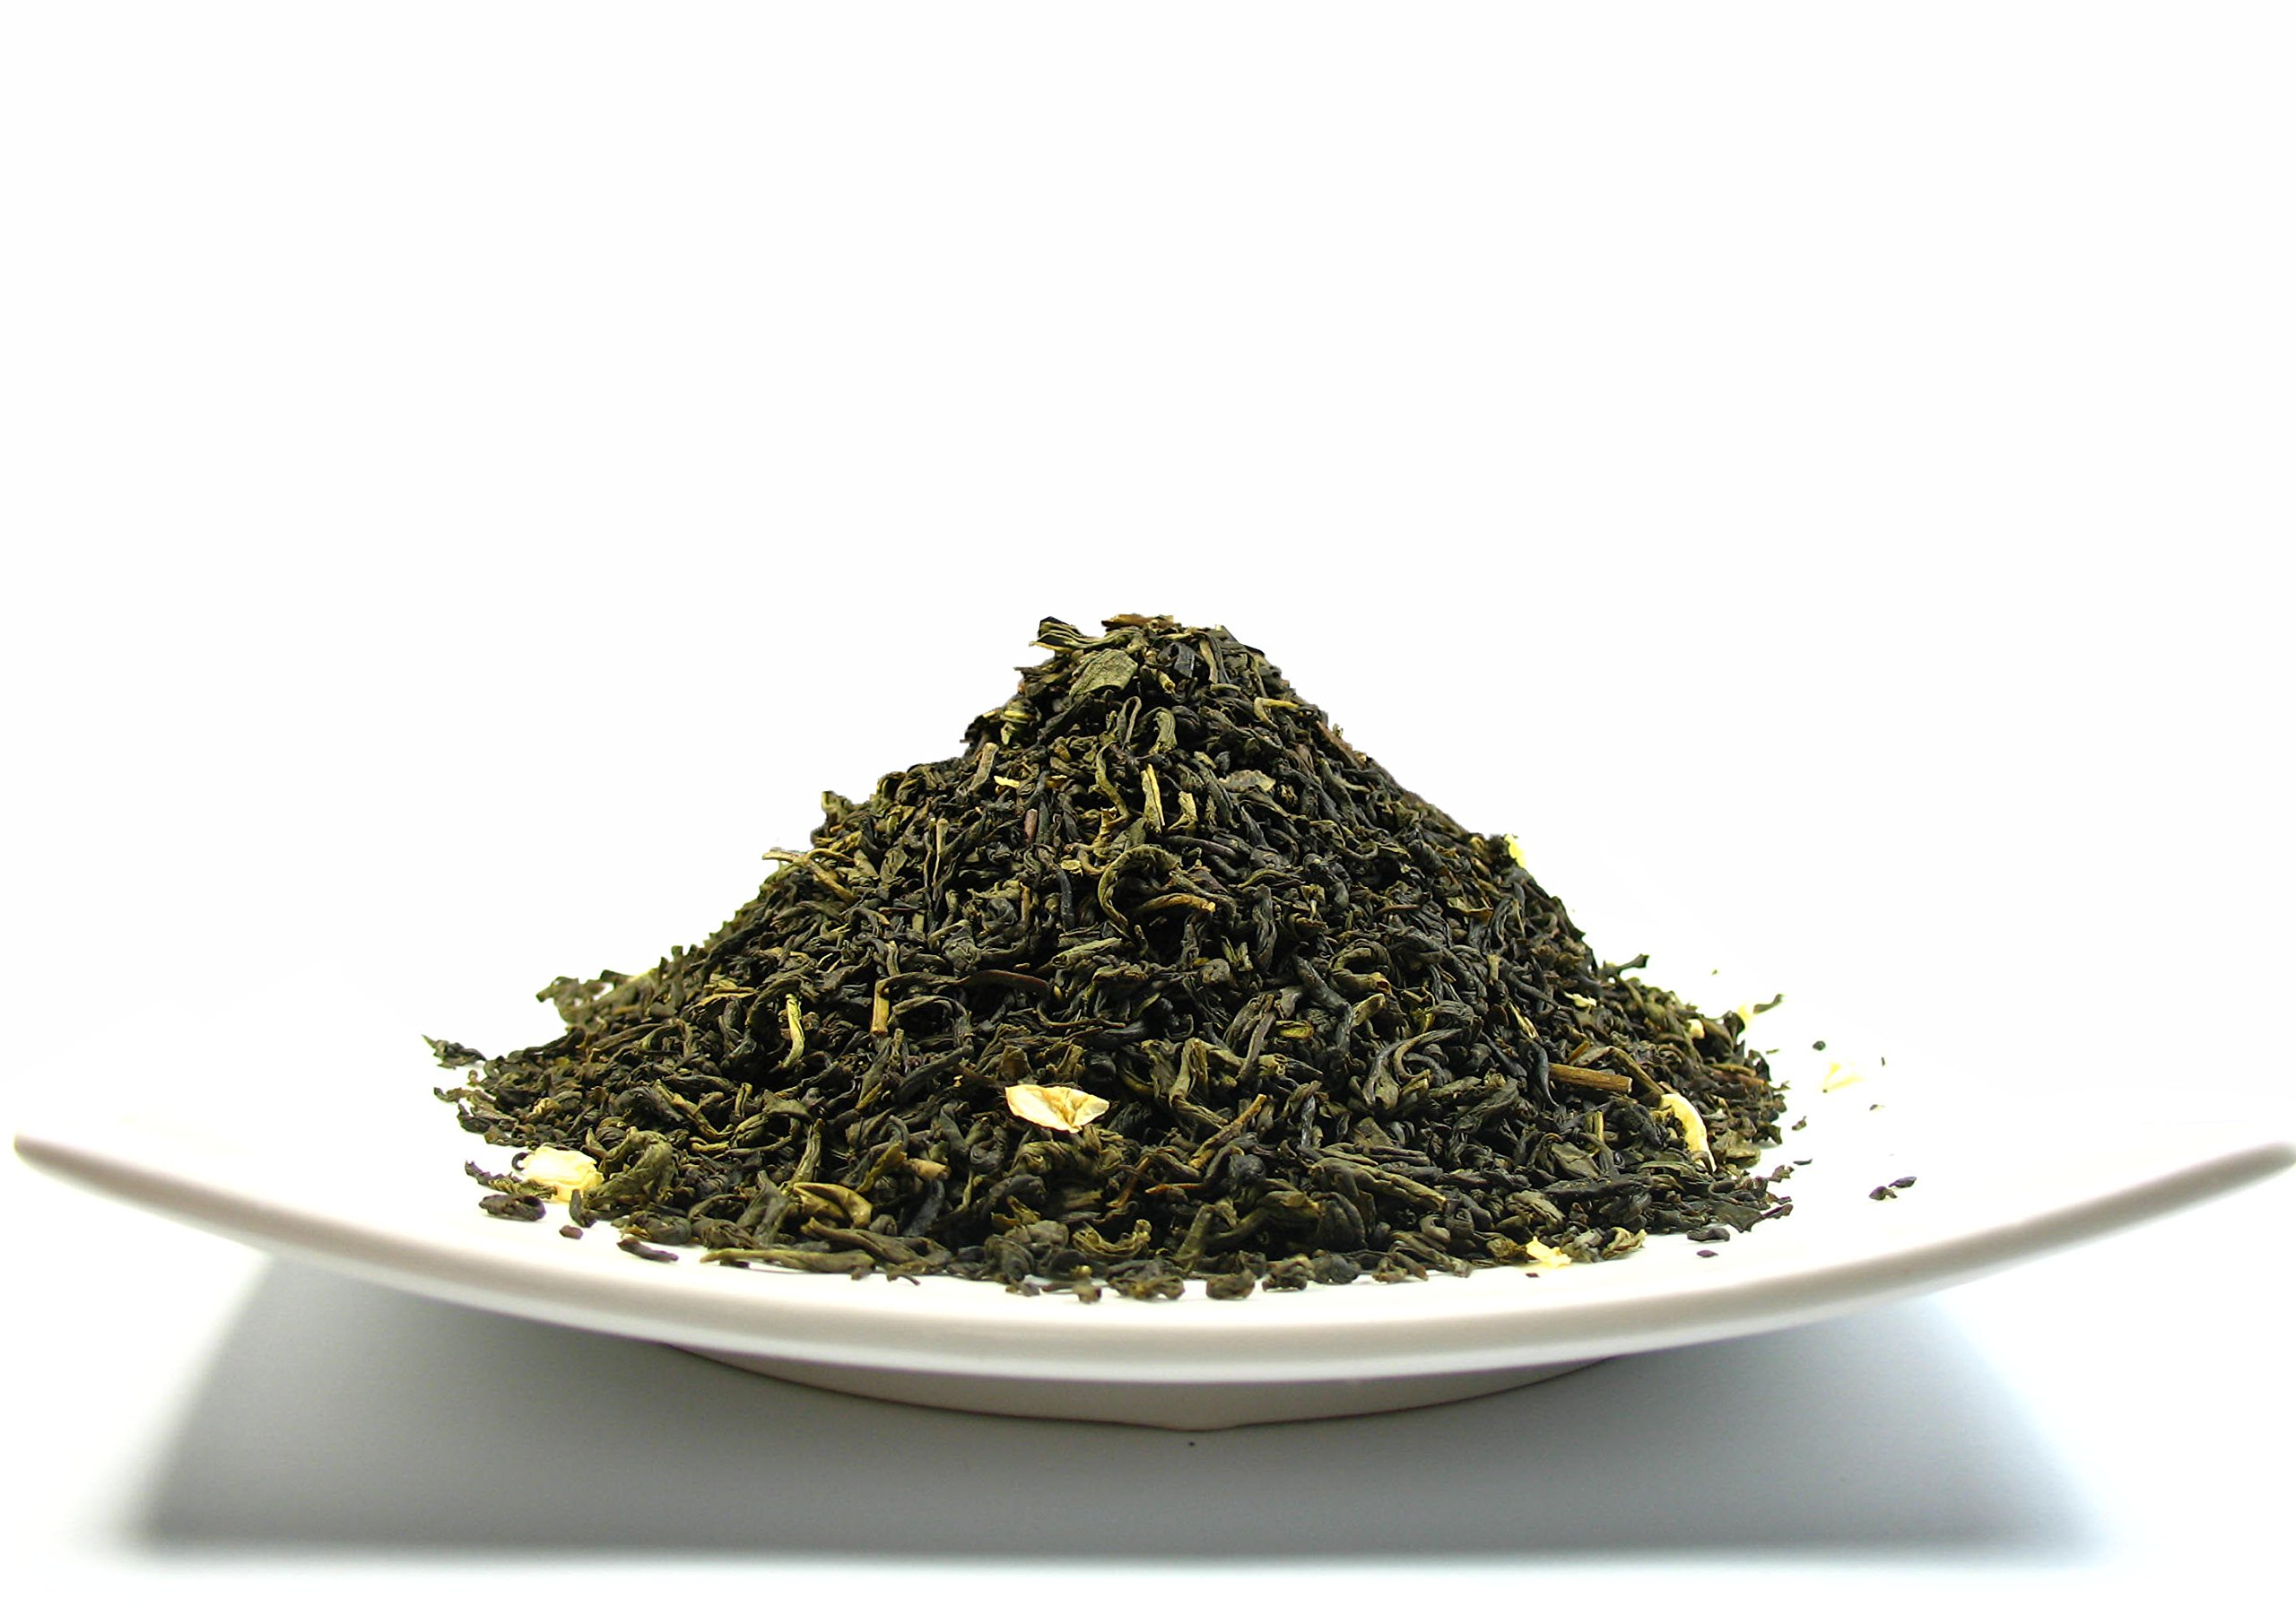 Decaf Jasmine Green Tea, Perfect beverage who wish for Caffeine-Free Tea – 5 lb Tea Bag